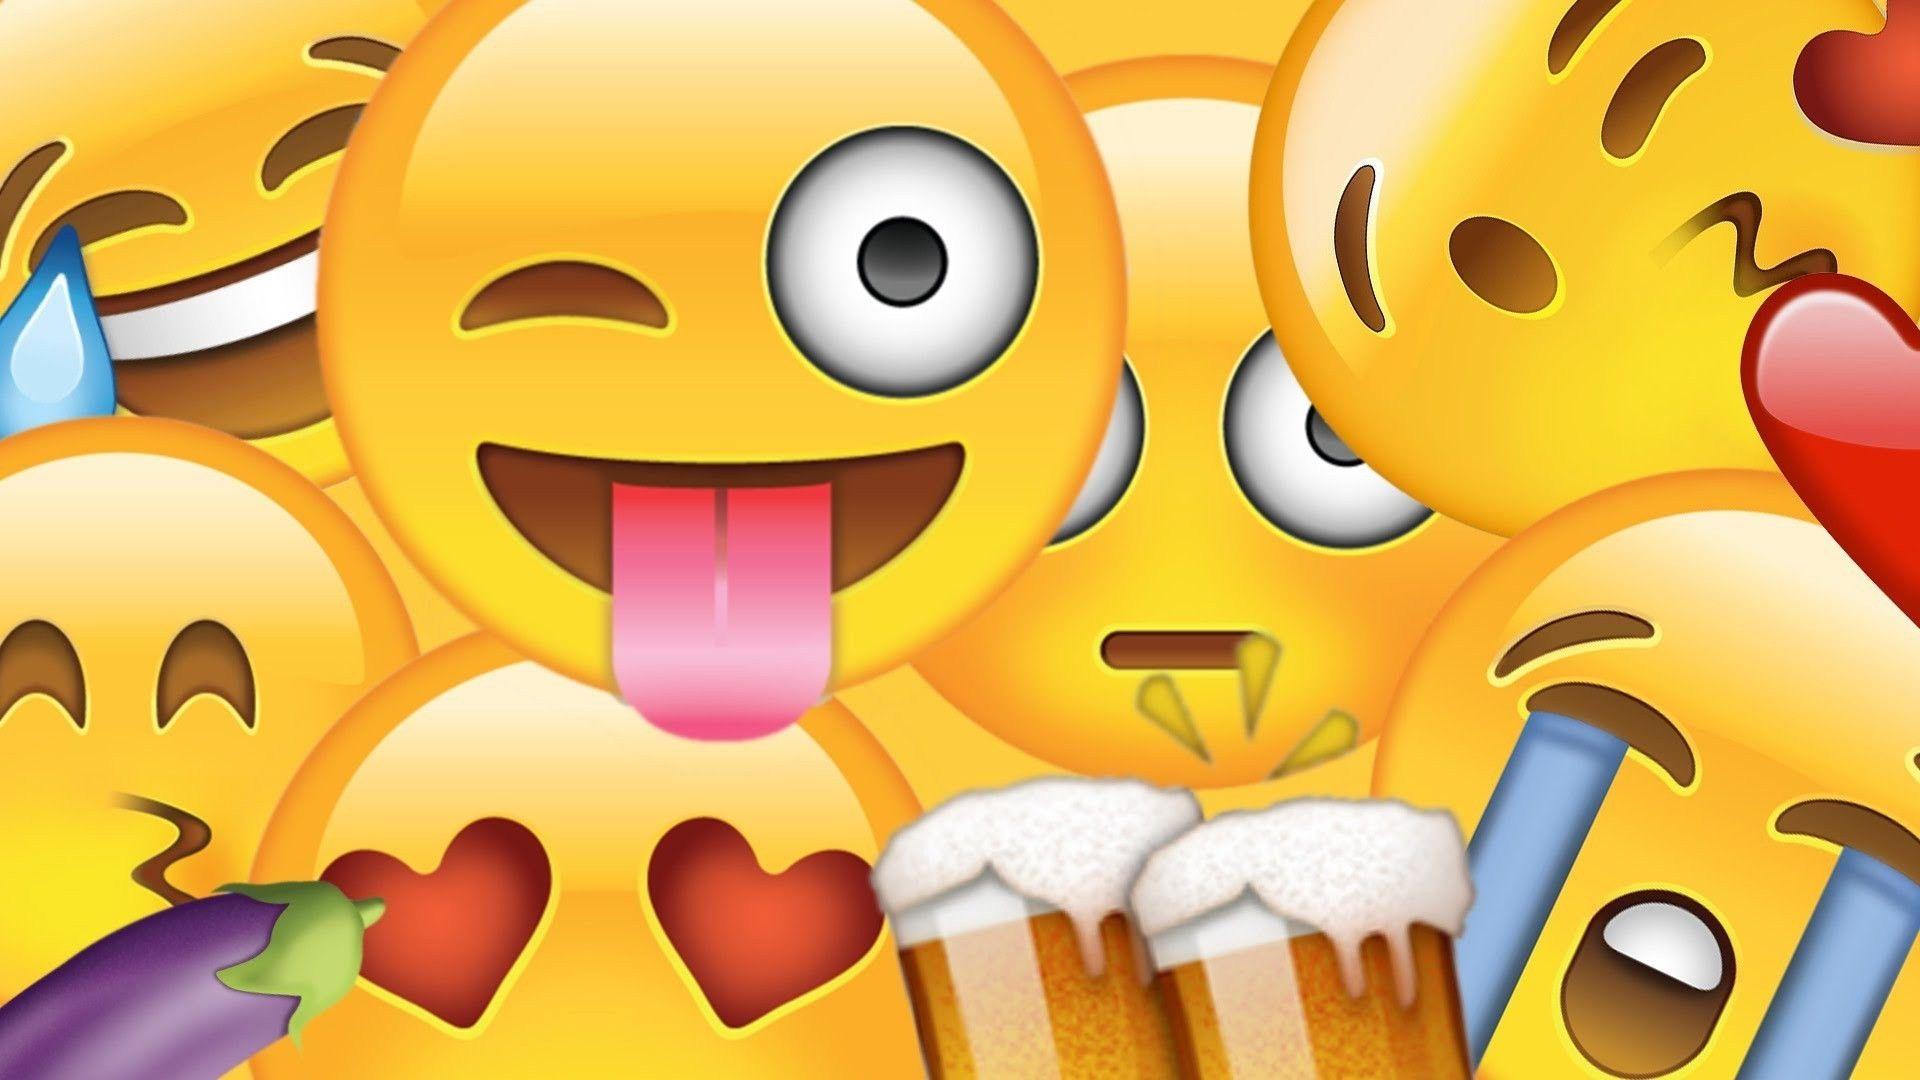 10 Latest Emoji Wallpaper For Computer Full Hd 1920 1080 For Pc Background Monkey Emoji Wallpapers Emoji Wallpaper Cute Emoji Wallpaper